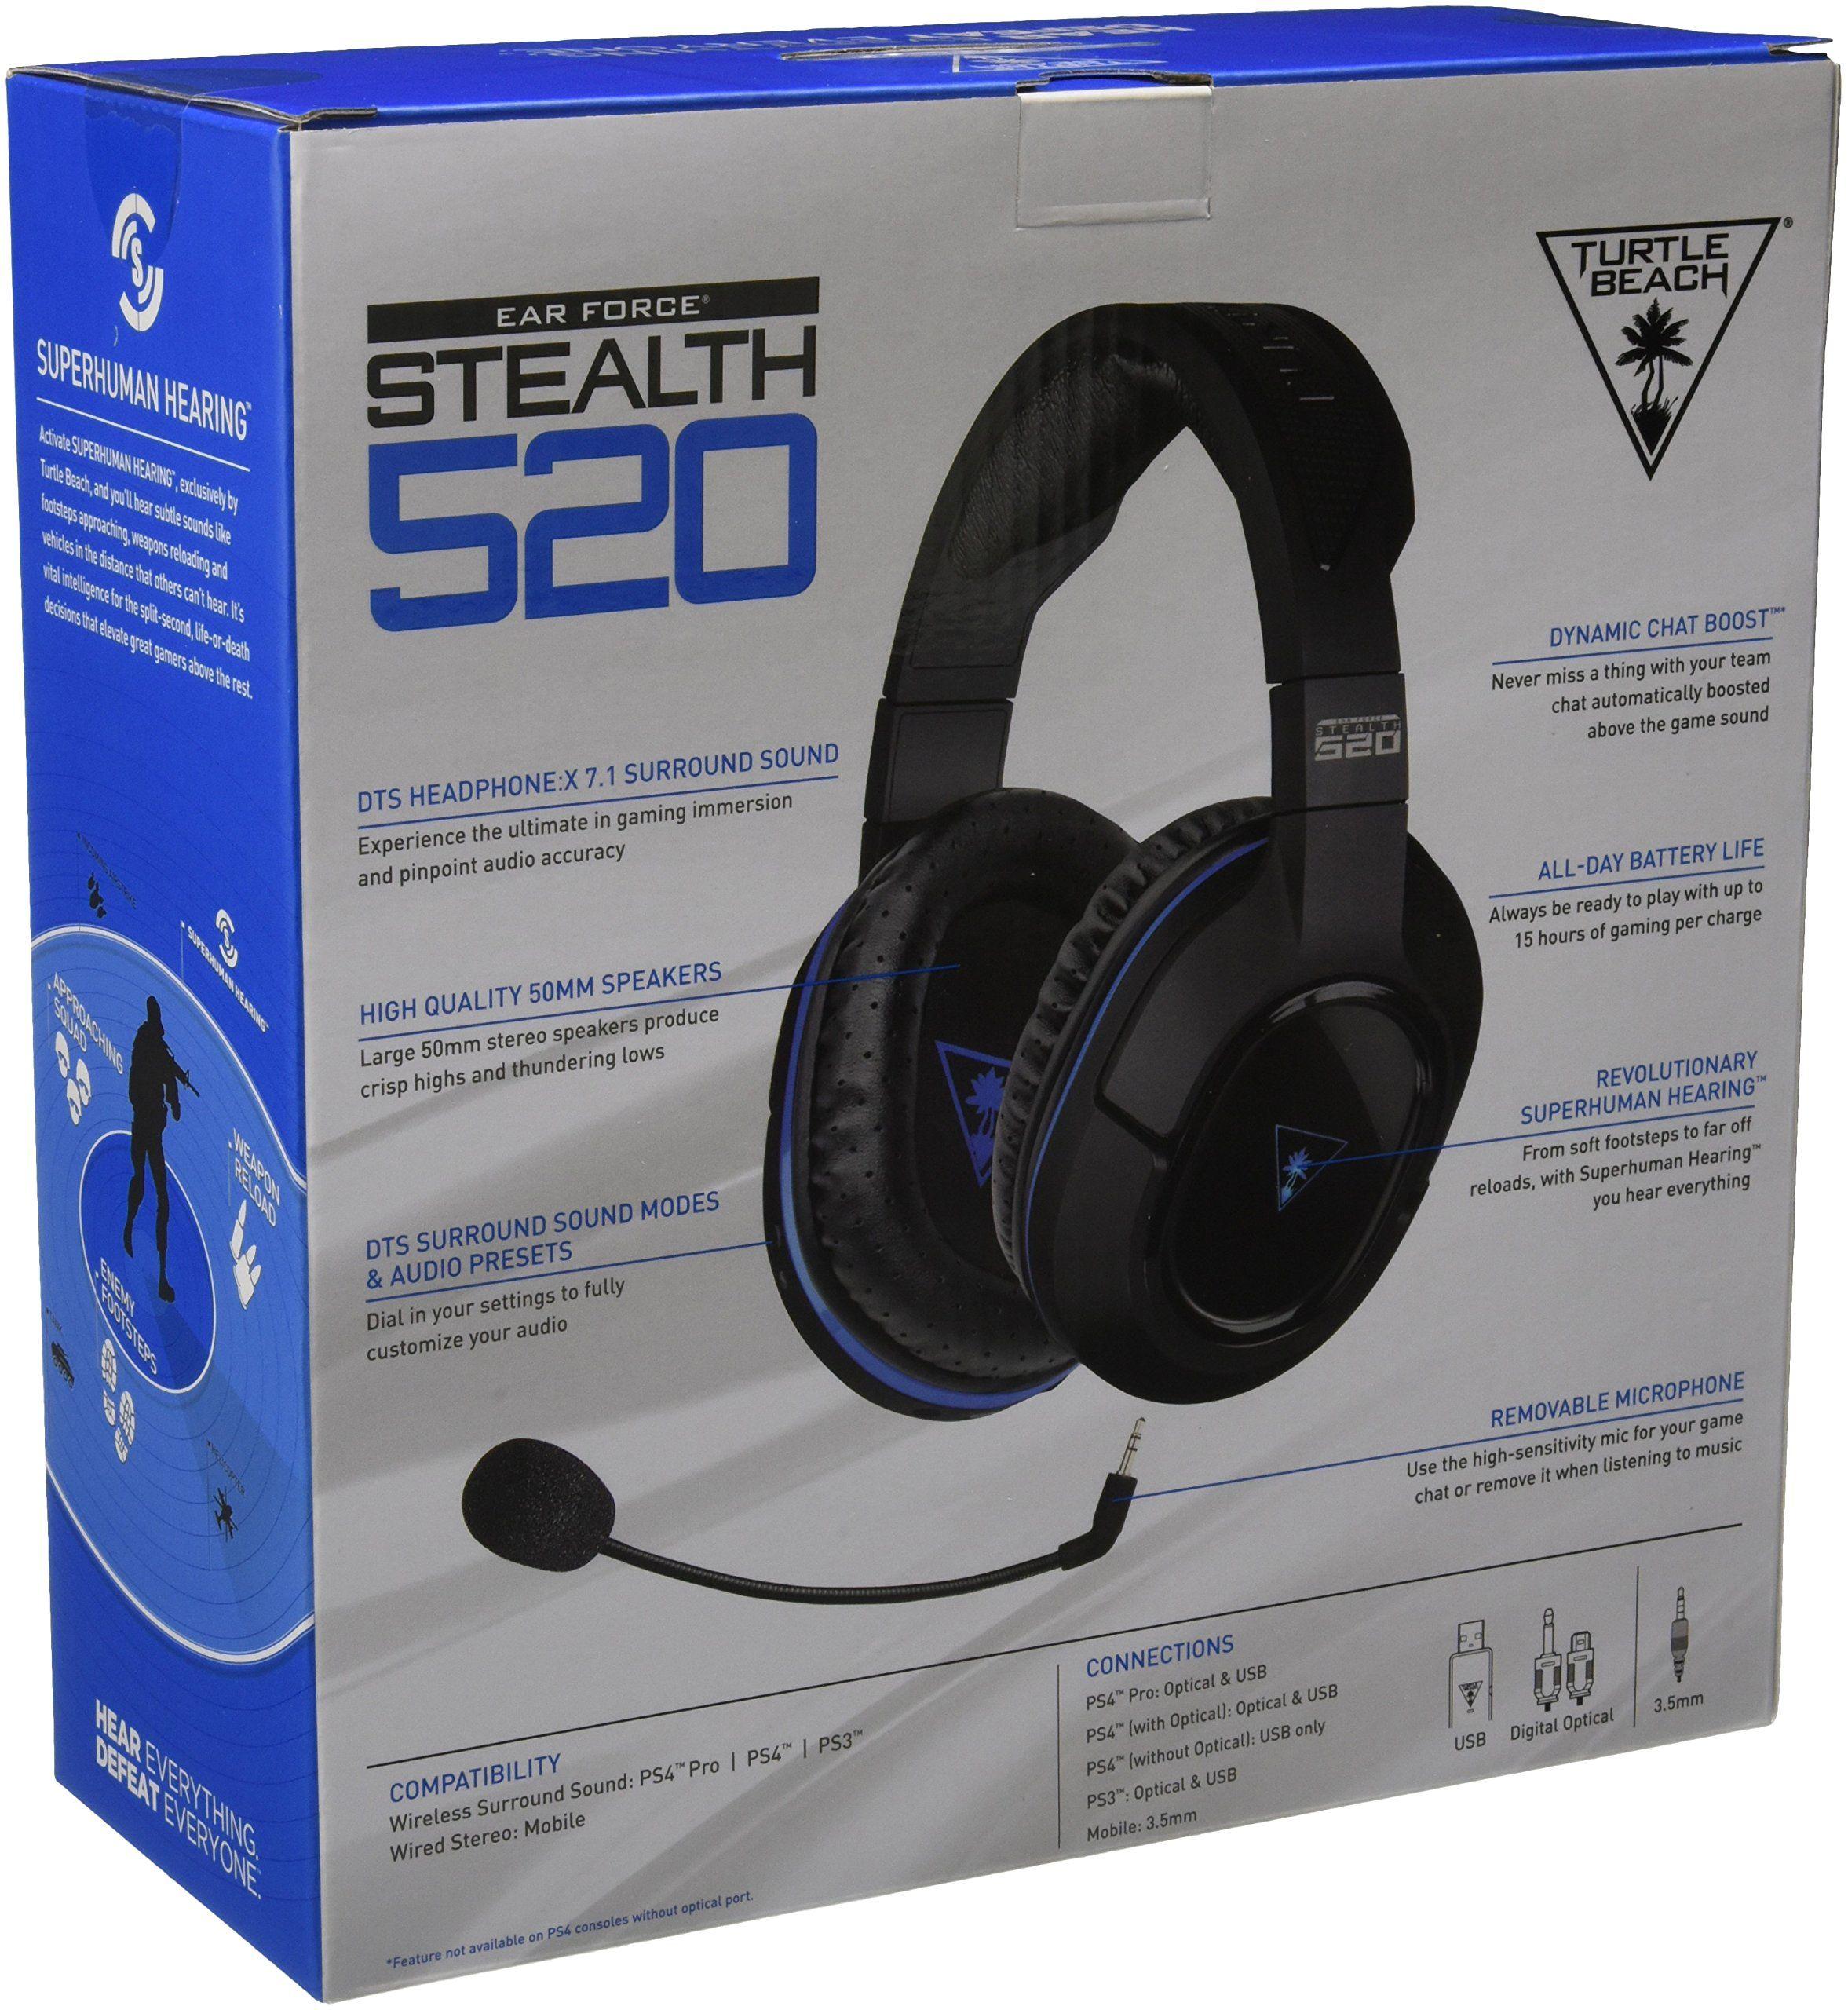 Turtle Beach Stealth 520 Premium Fully Wireless Gaming Headset Ps4 Pro Ps4 Wireless Gaming Headset Turtle Beach Gaming Headset